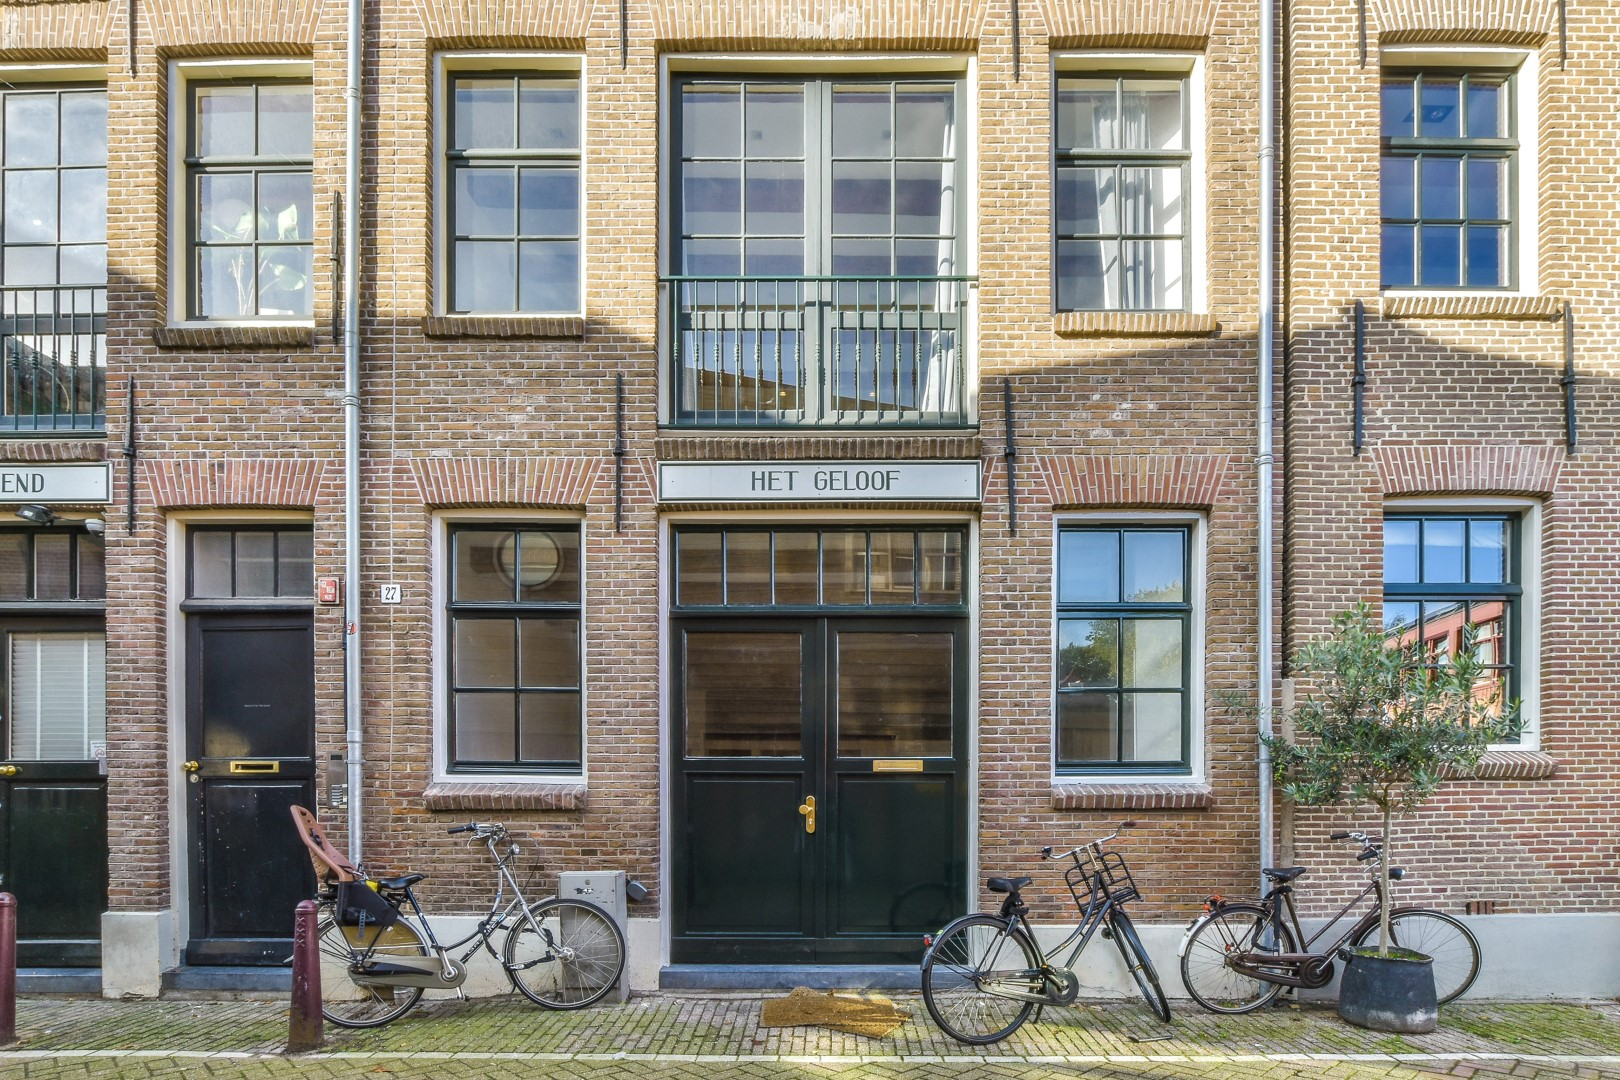 Prinseneiland 27 D 1013 LL, Amsterdam, Noord-Holland Nederland, 2 Bedrooms Bedrooms, ,1 BathroomBathrooms,Apartment,For Rent,Prinseneiland,1,1498